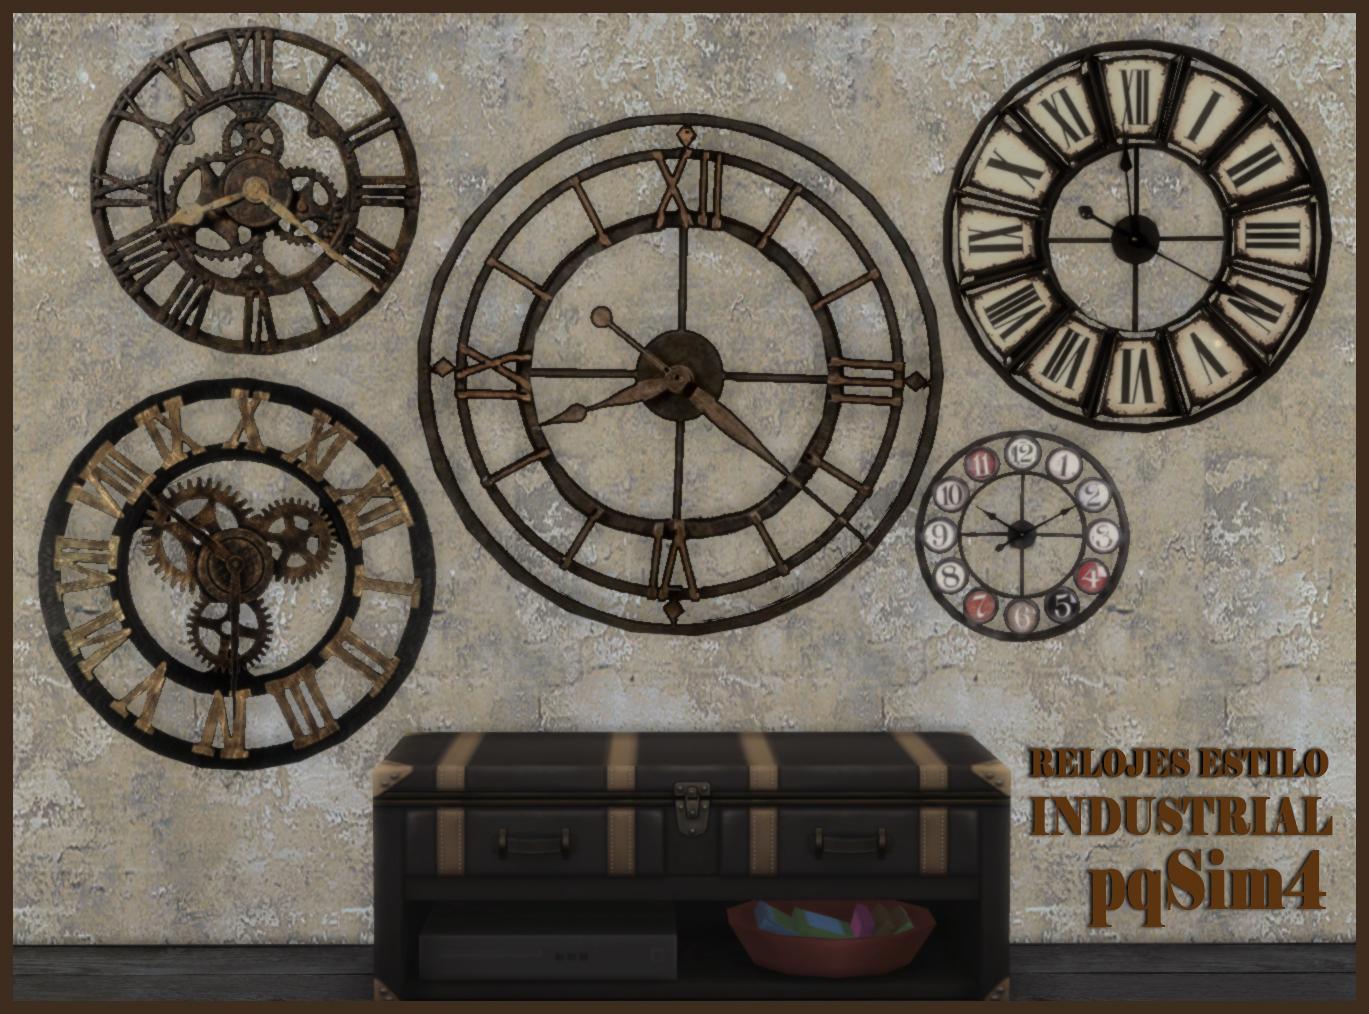 Relojes de pared industrial style sims 4 custom content for Reloj pared estilo industrial